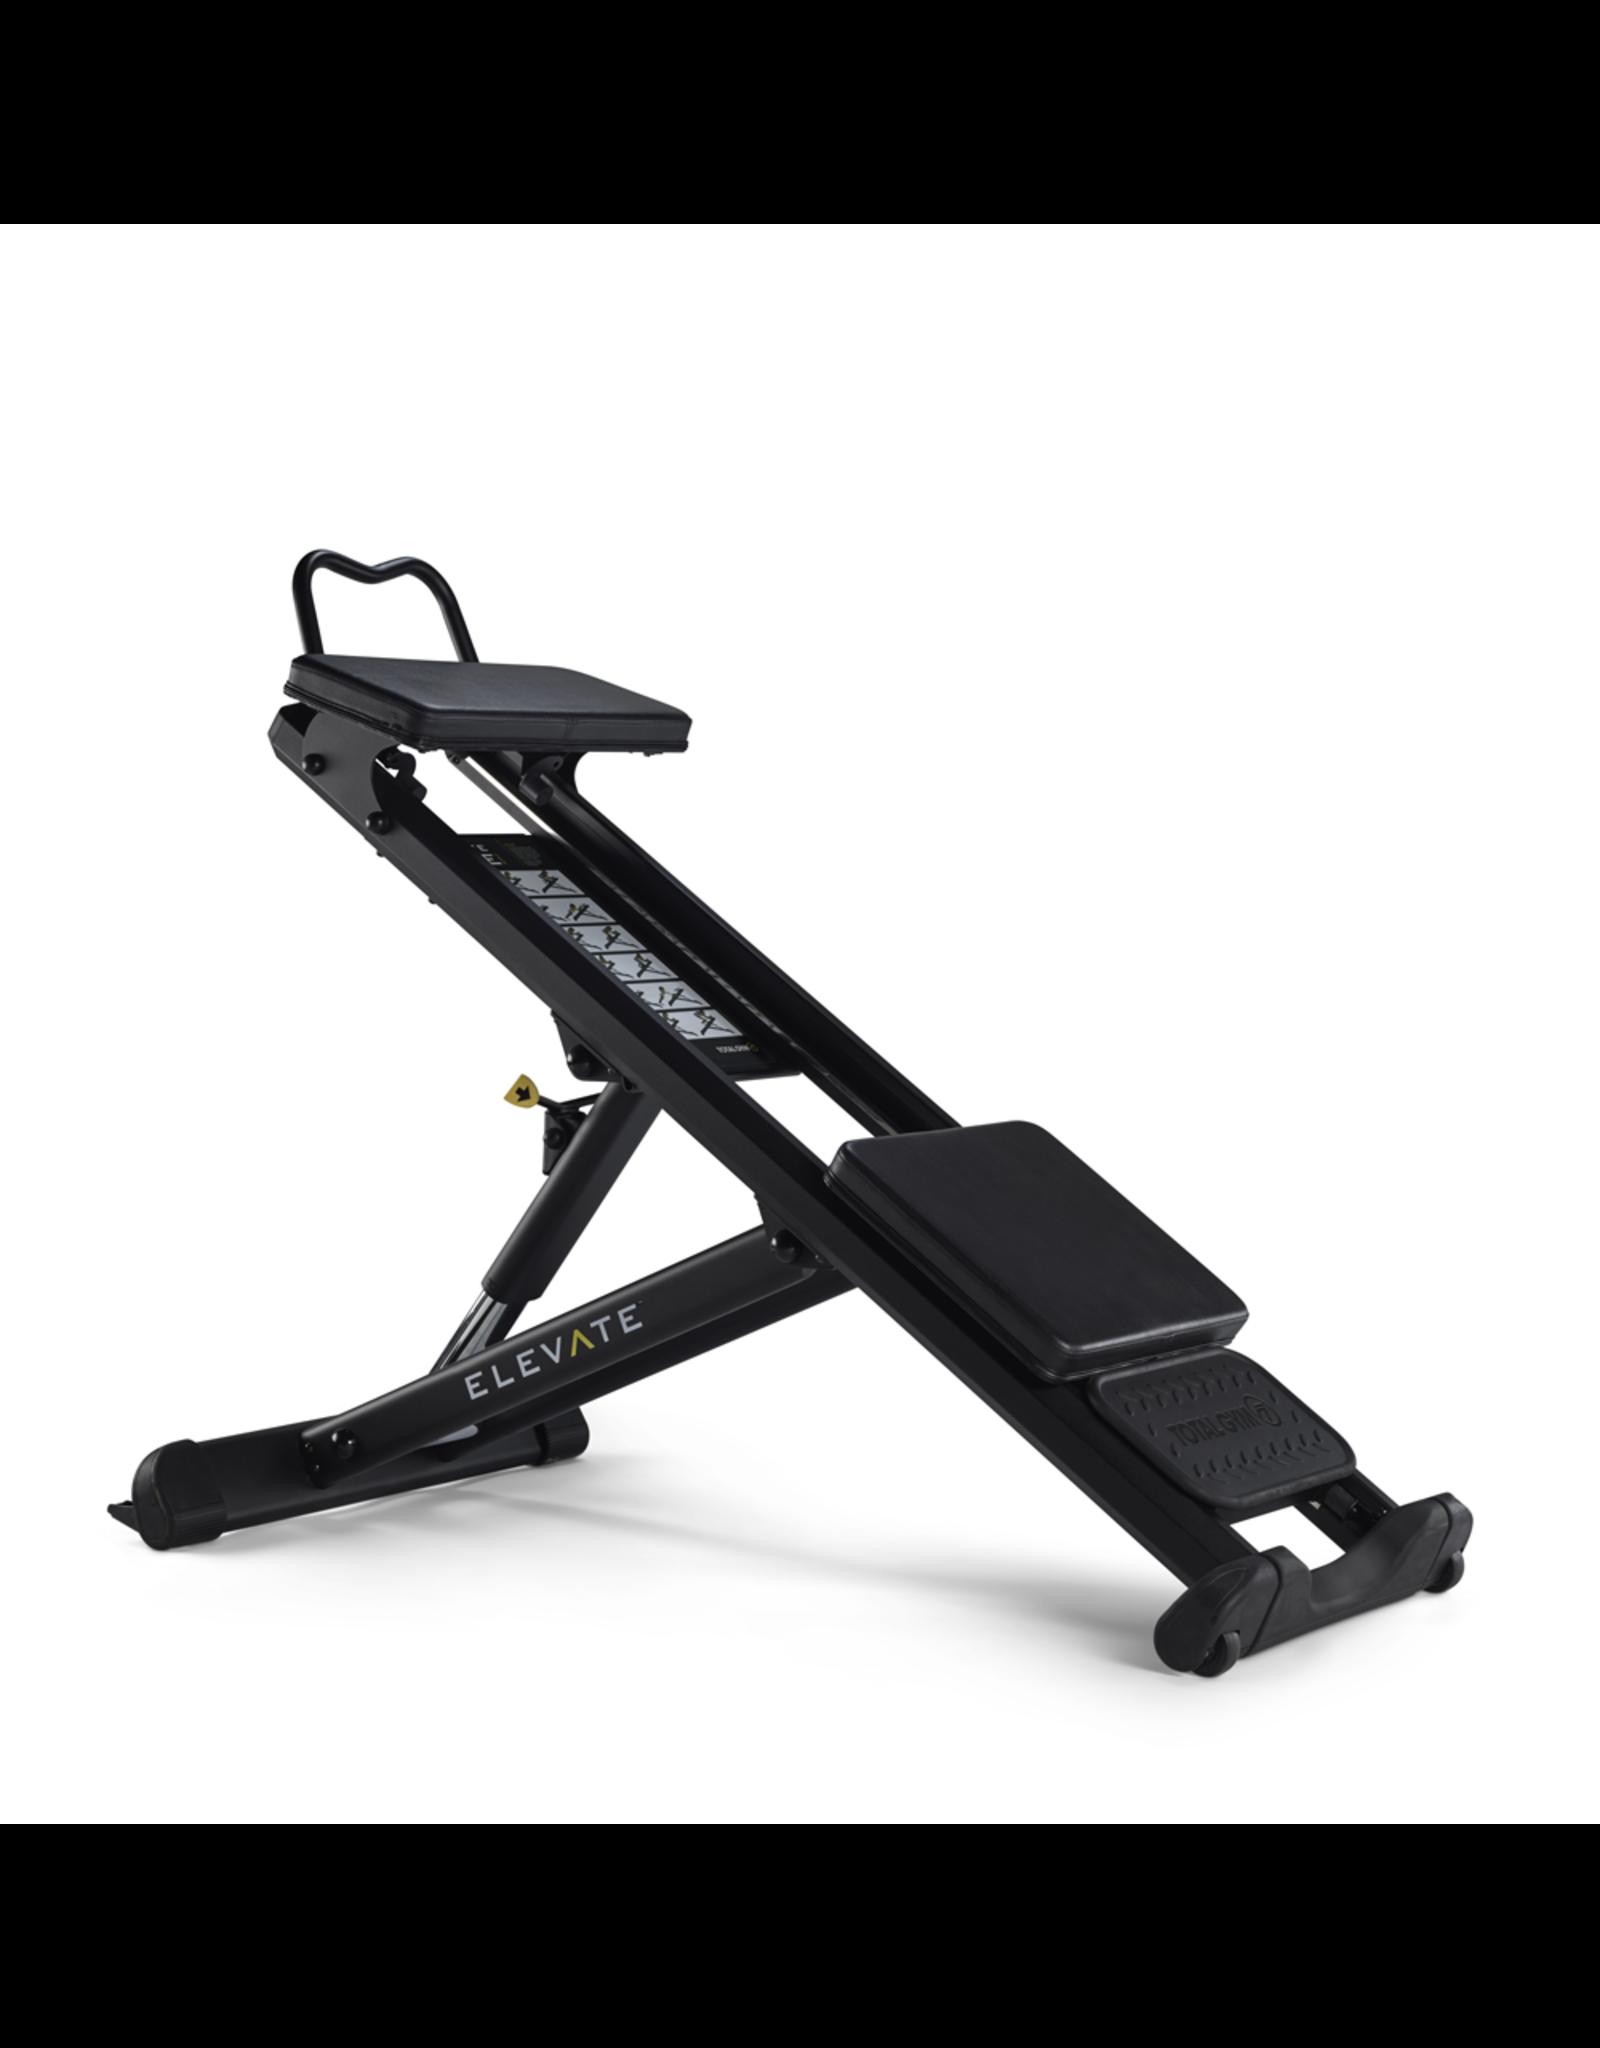 Total Gym Total Gym - Elevate Core Adj